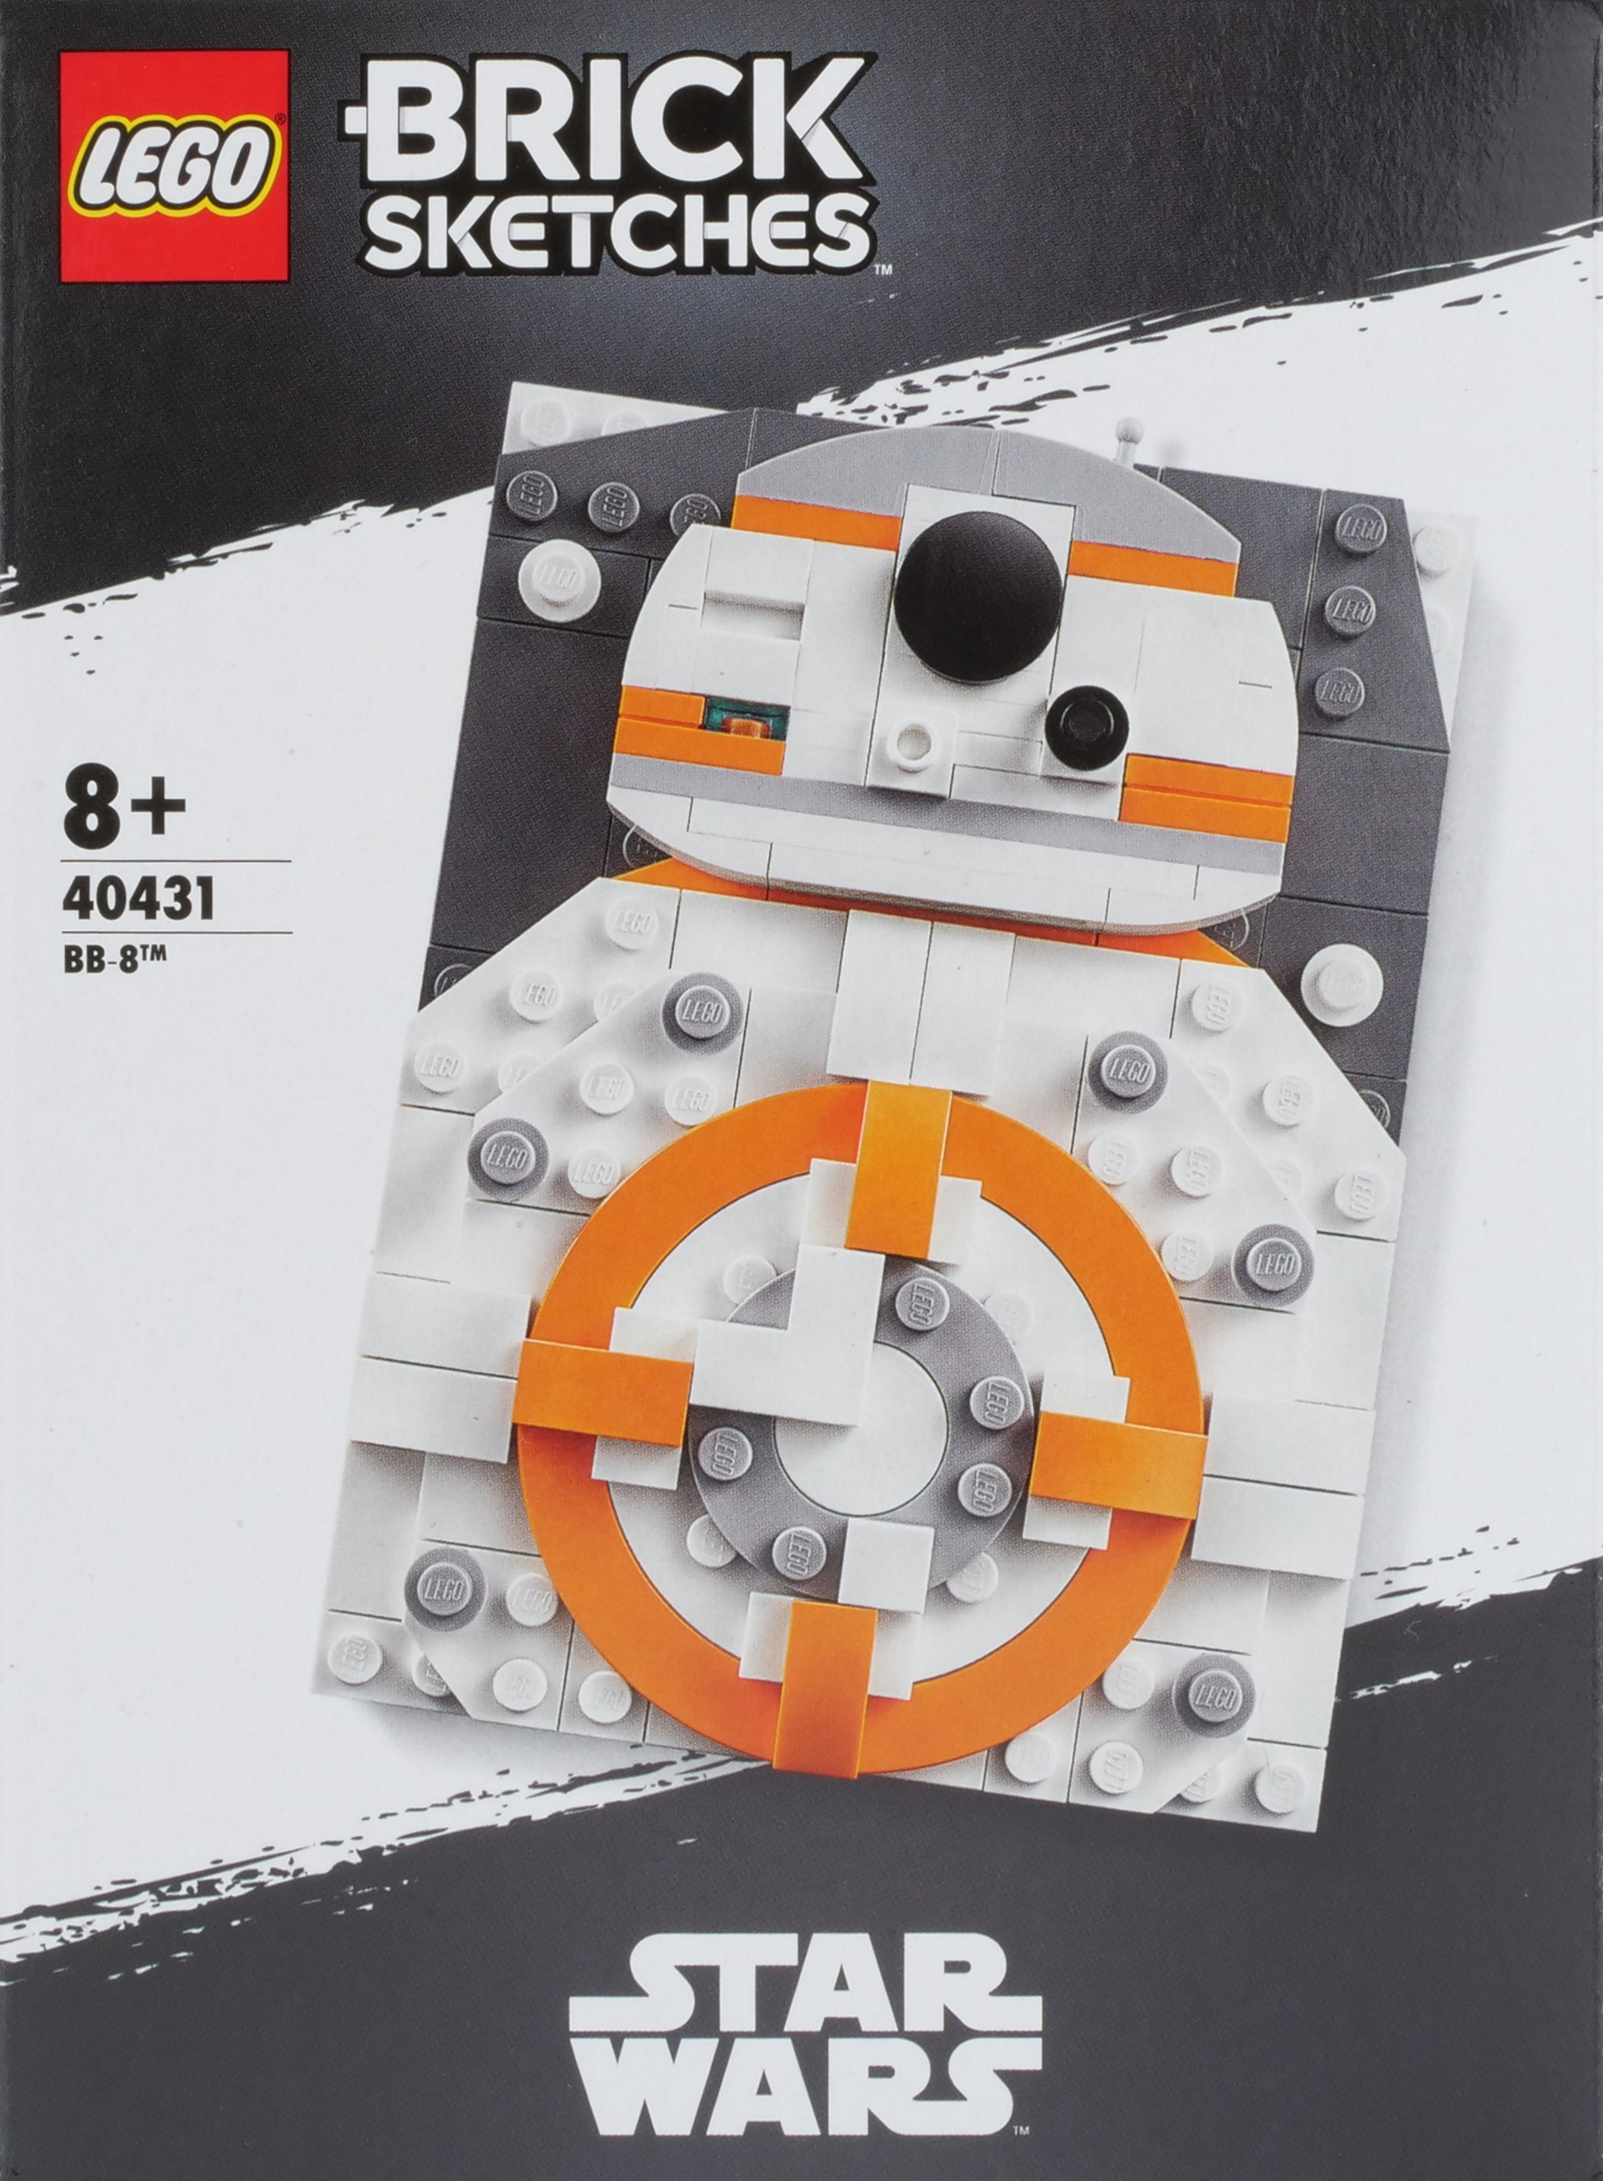 lego-brick-sketches-bb-8.jpg